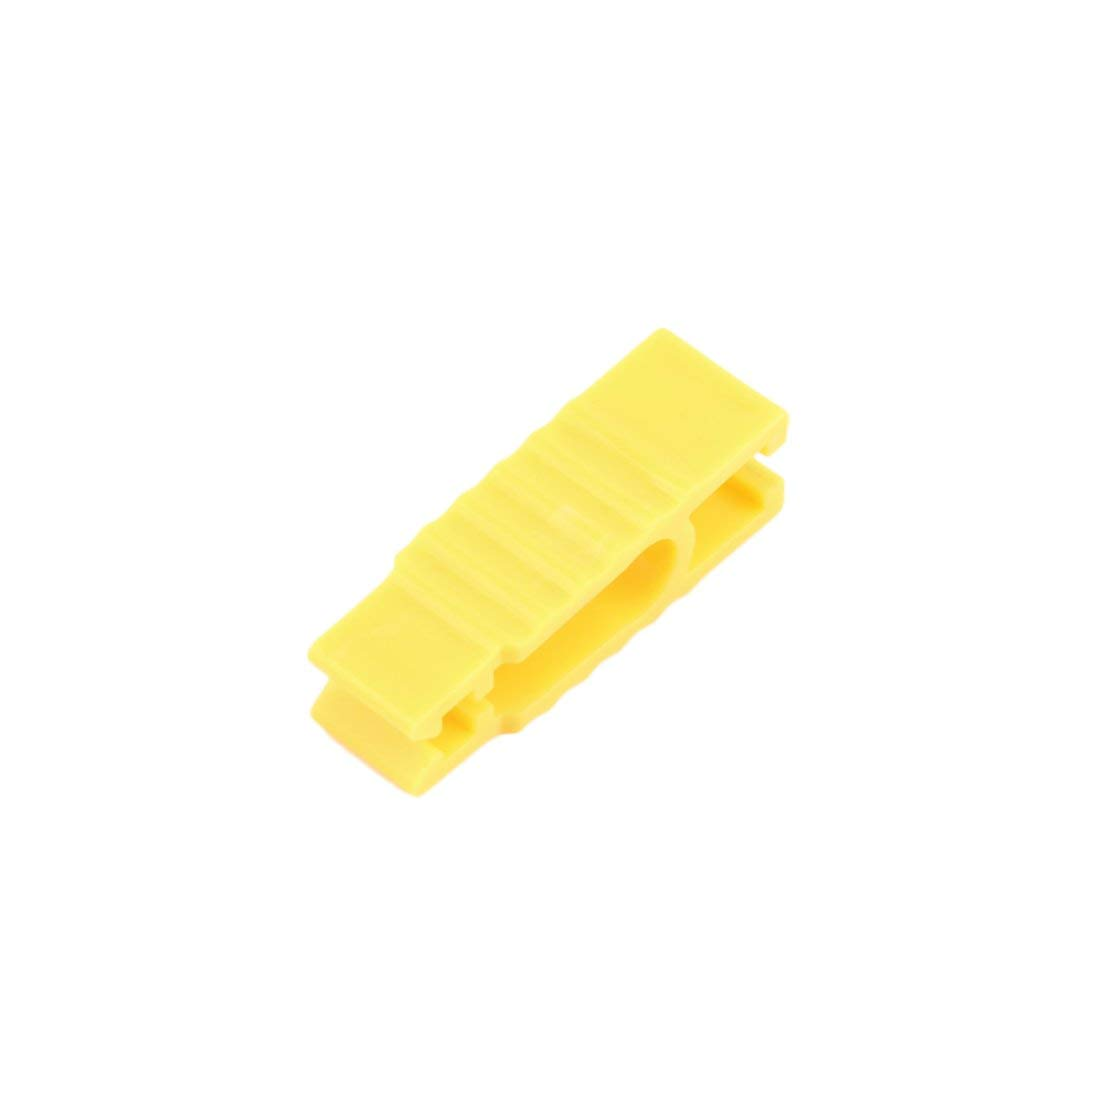 120 Unids//Lote Automotriz Blade Fuse Box Car APM Mini Blade Conjunto Mixto 2A 3A 5A 7.5A 10A 15A 20A 25A 30A 35A CGKCH034 Kaemma Color:Multicolor